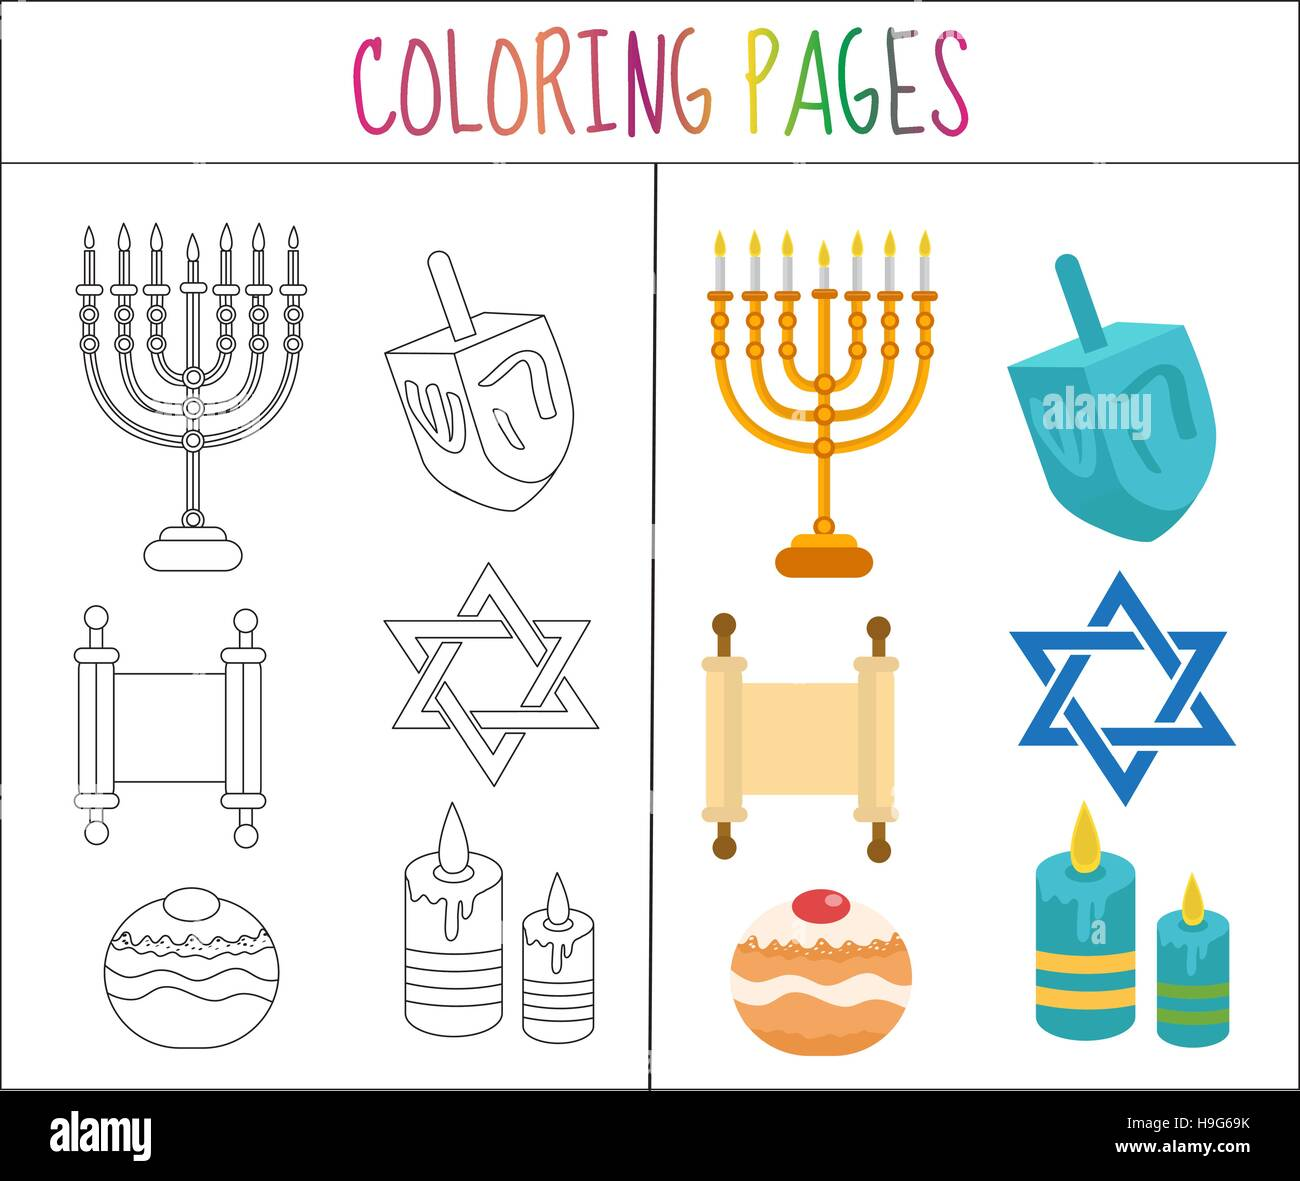 coloring book page hanukkah set sketch and color version for kids H9G69K